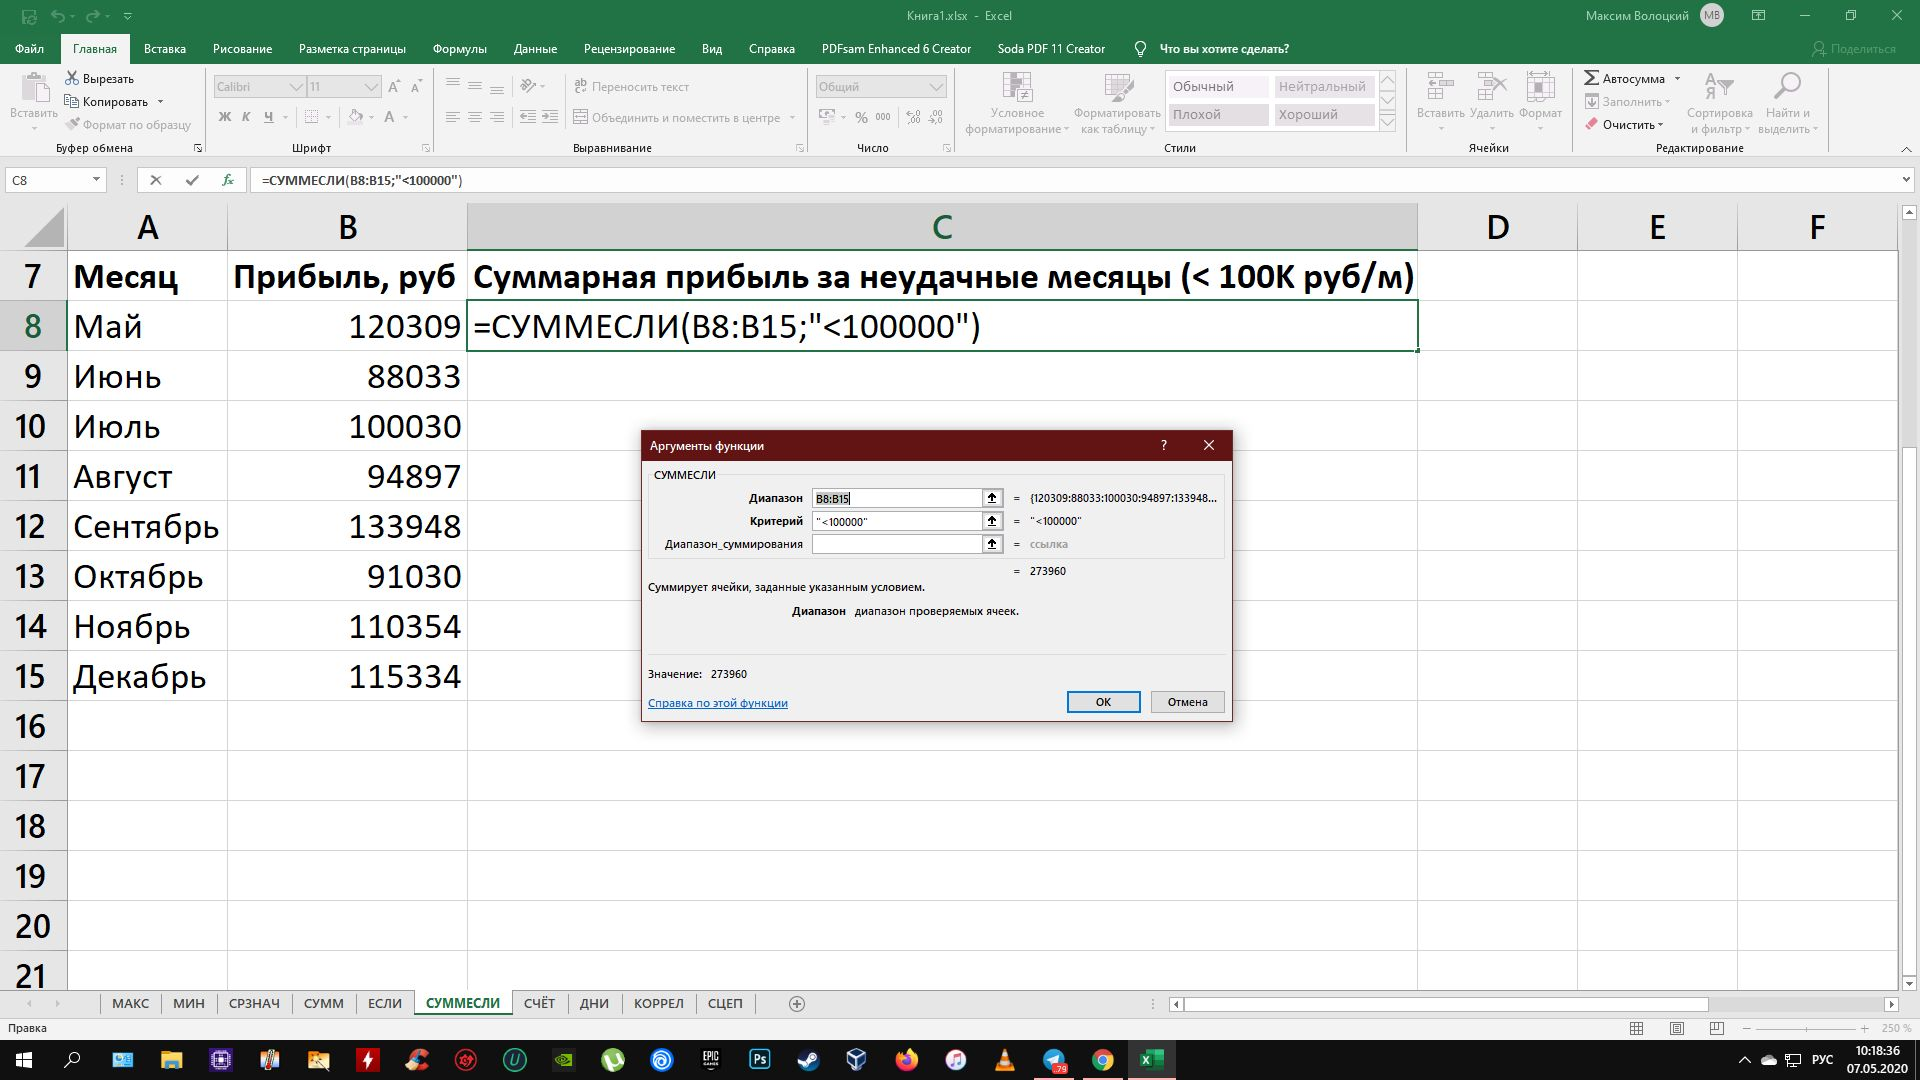 Функции Excel: СУММЕСЛИ